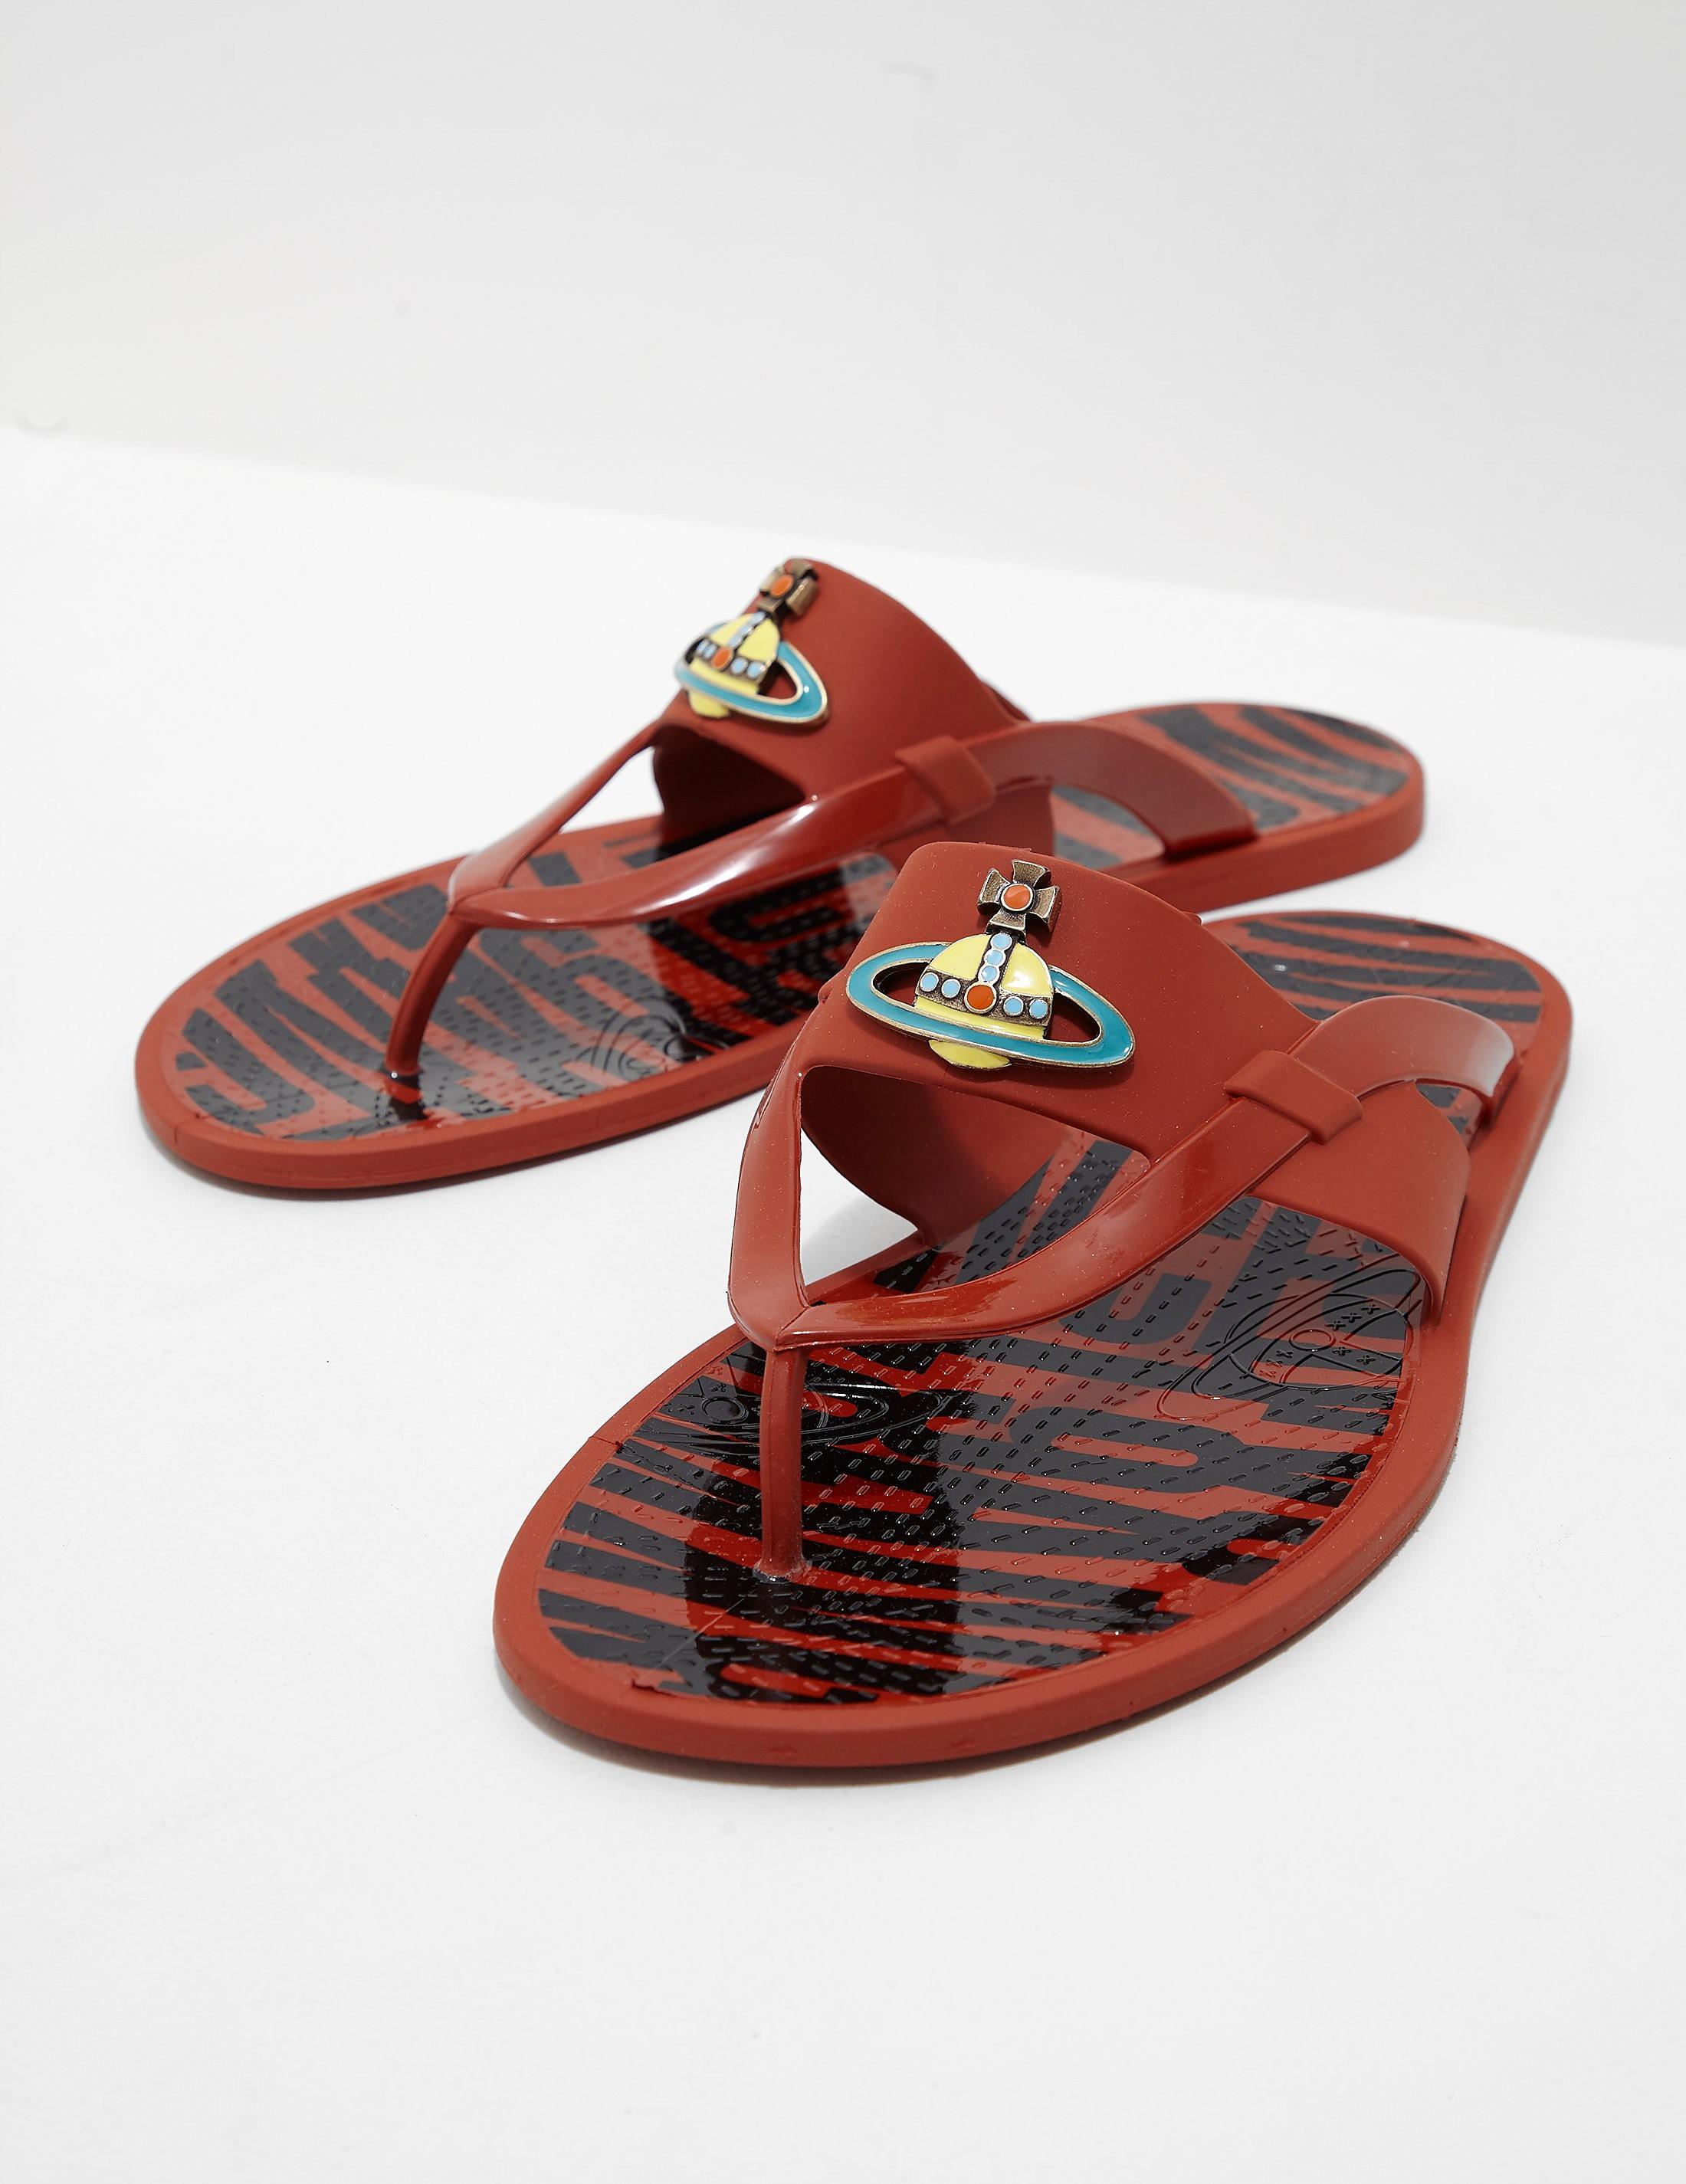 Vivienne Westwood Orb Sandal